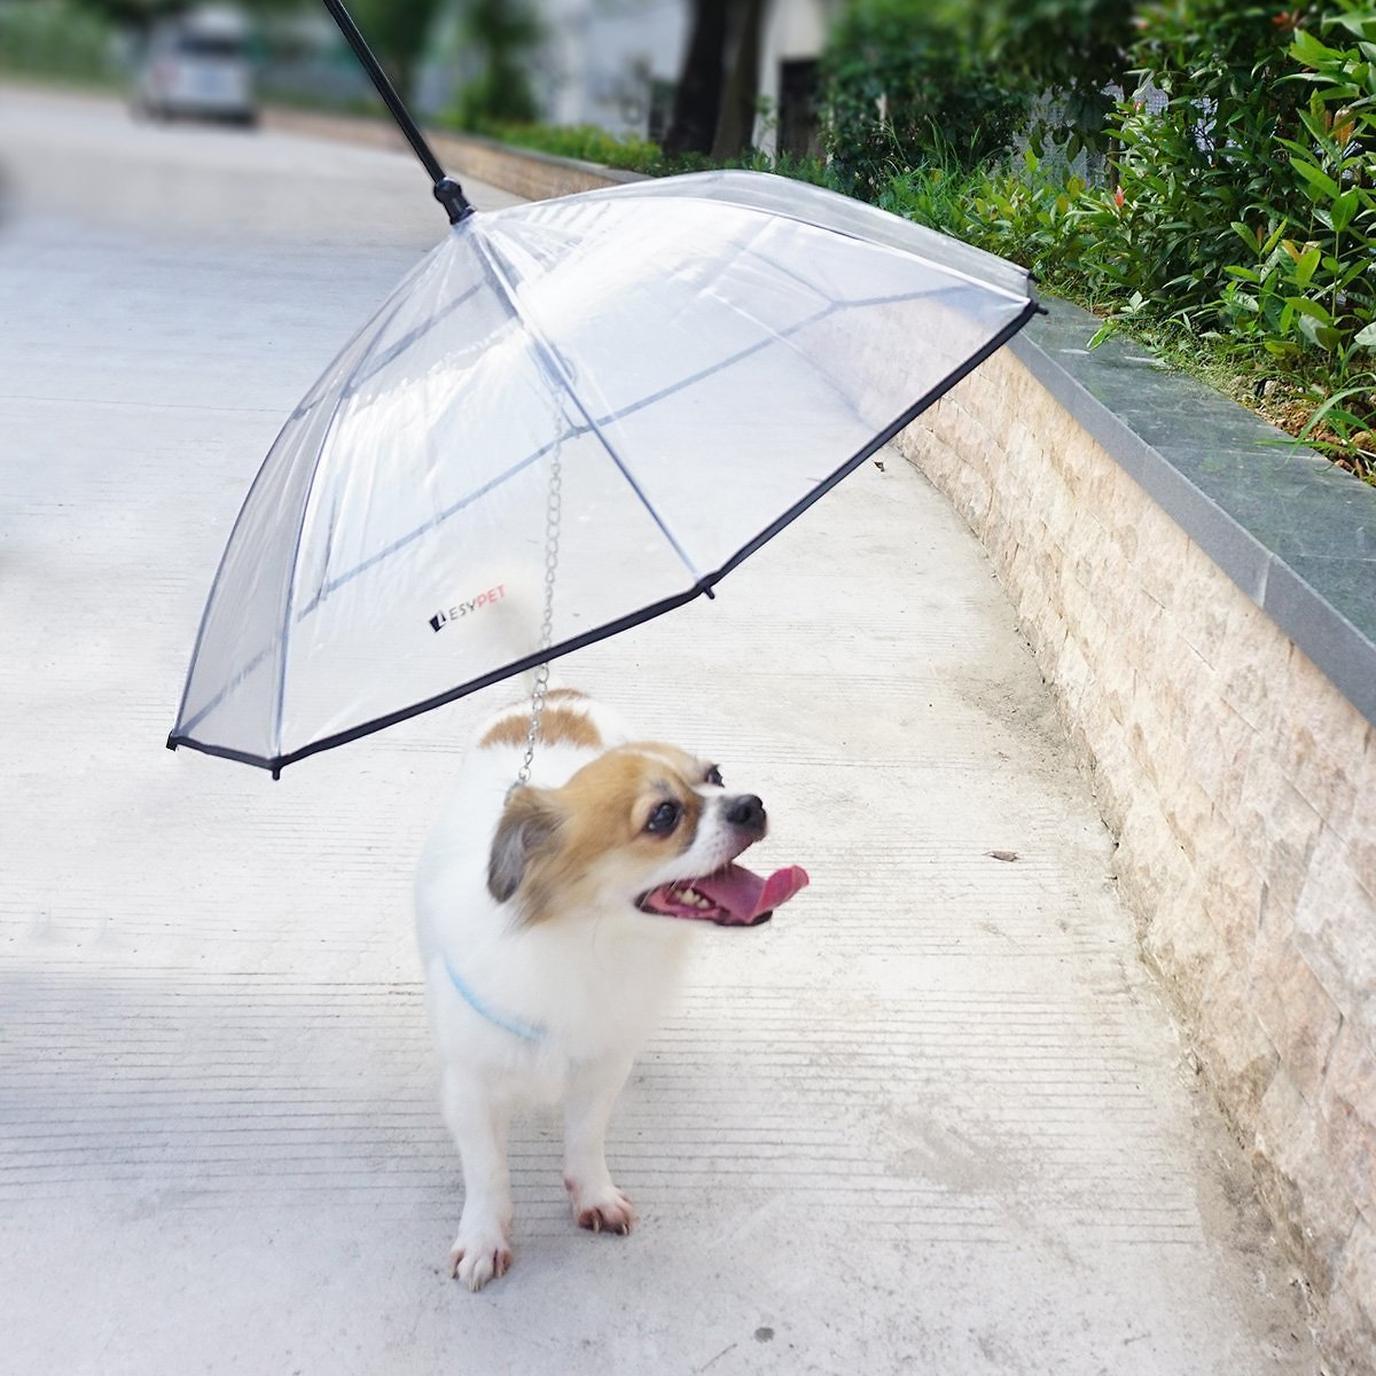 A Dog Walks Underneath the LesyPet Dog Umbrella With Leash.